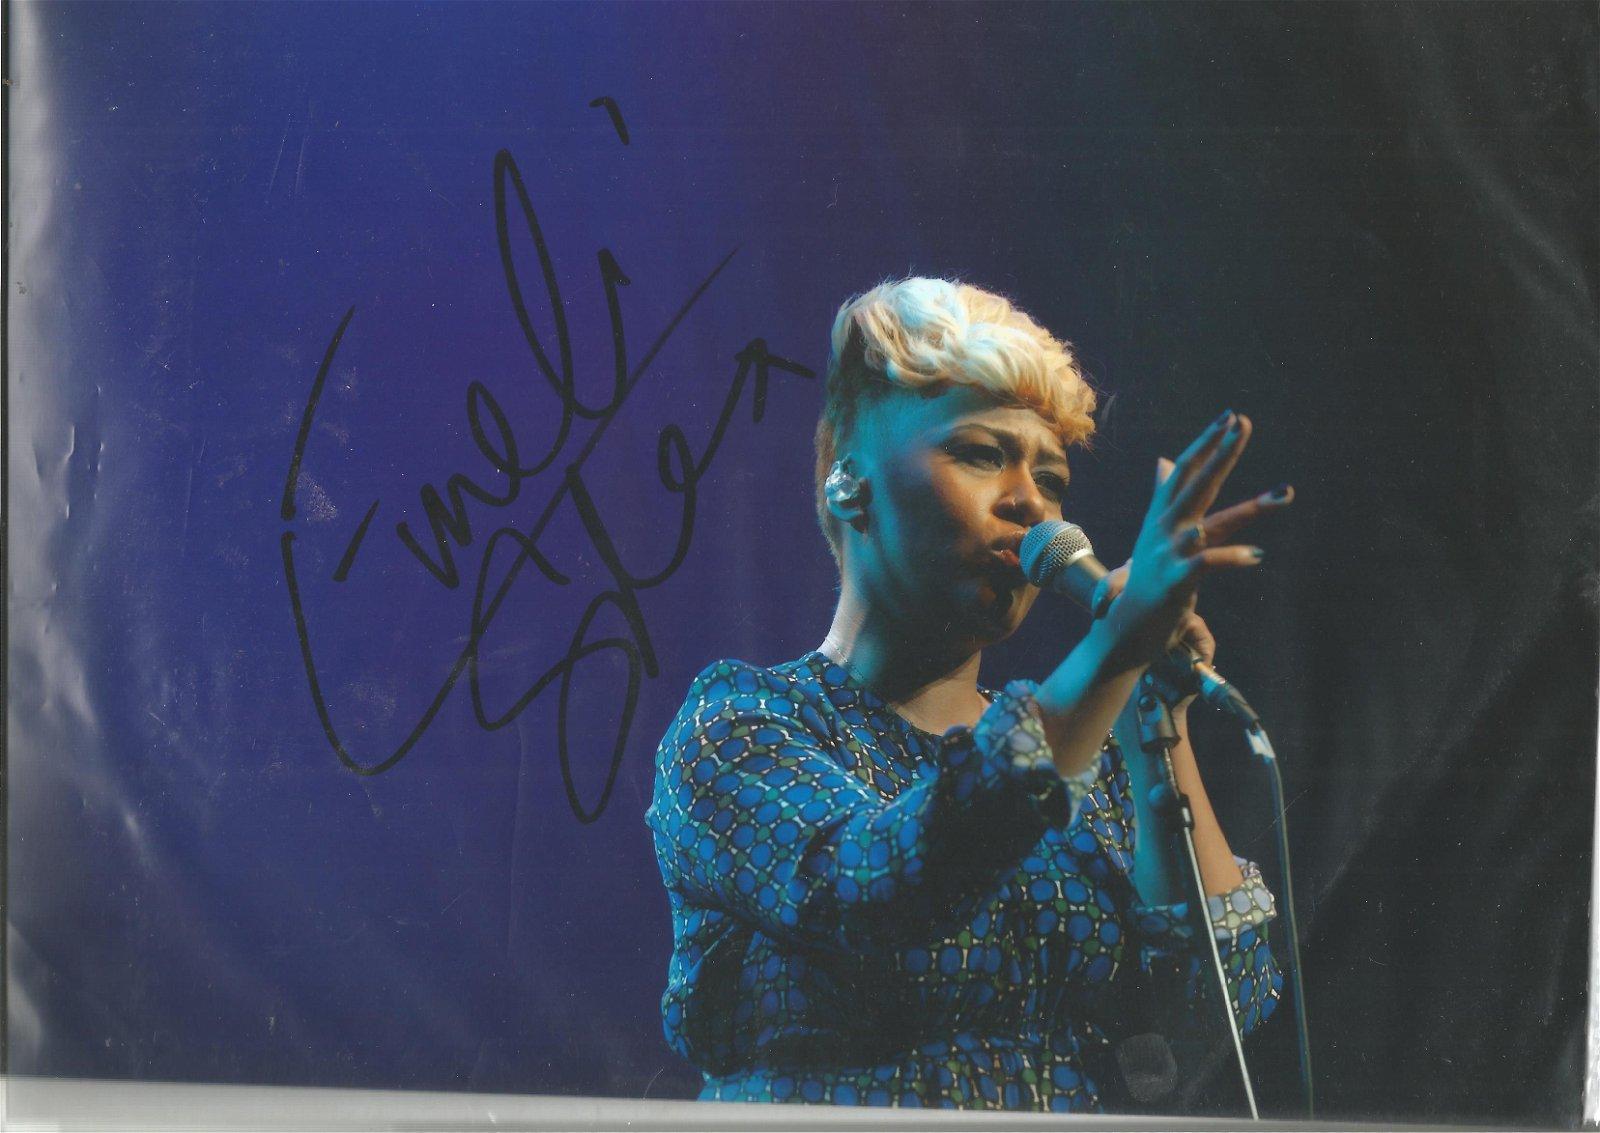 Emeli Sande Singer Signed 8x12 Photo. We combine